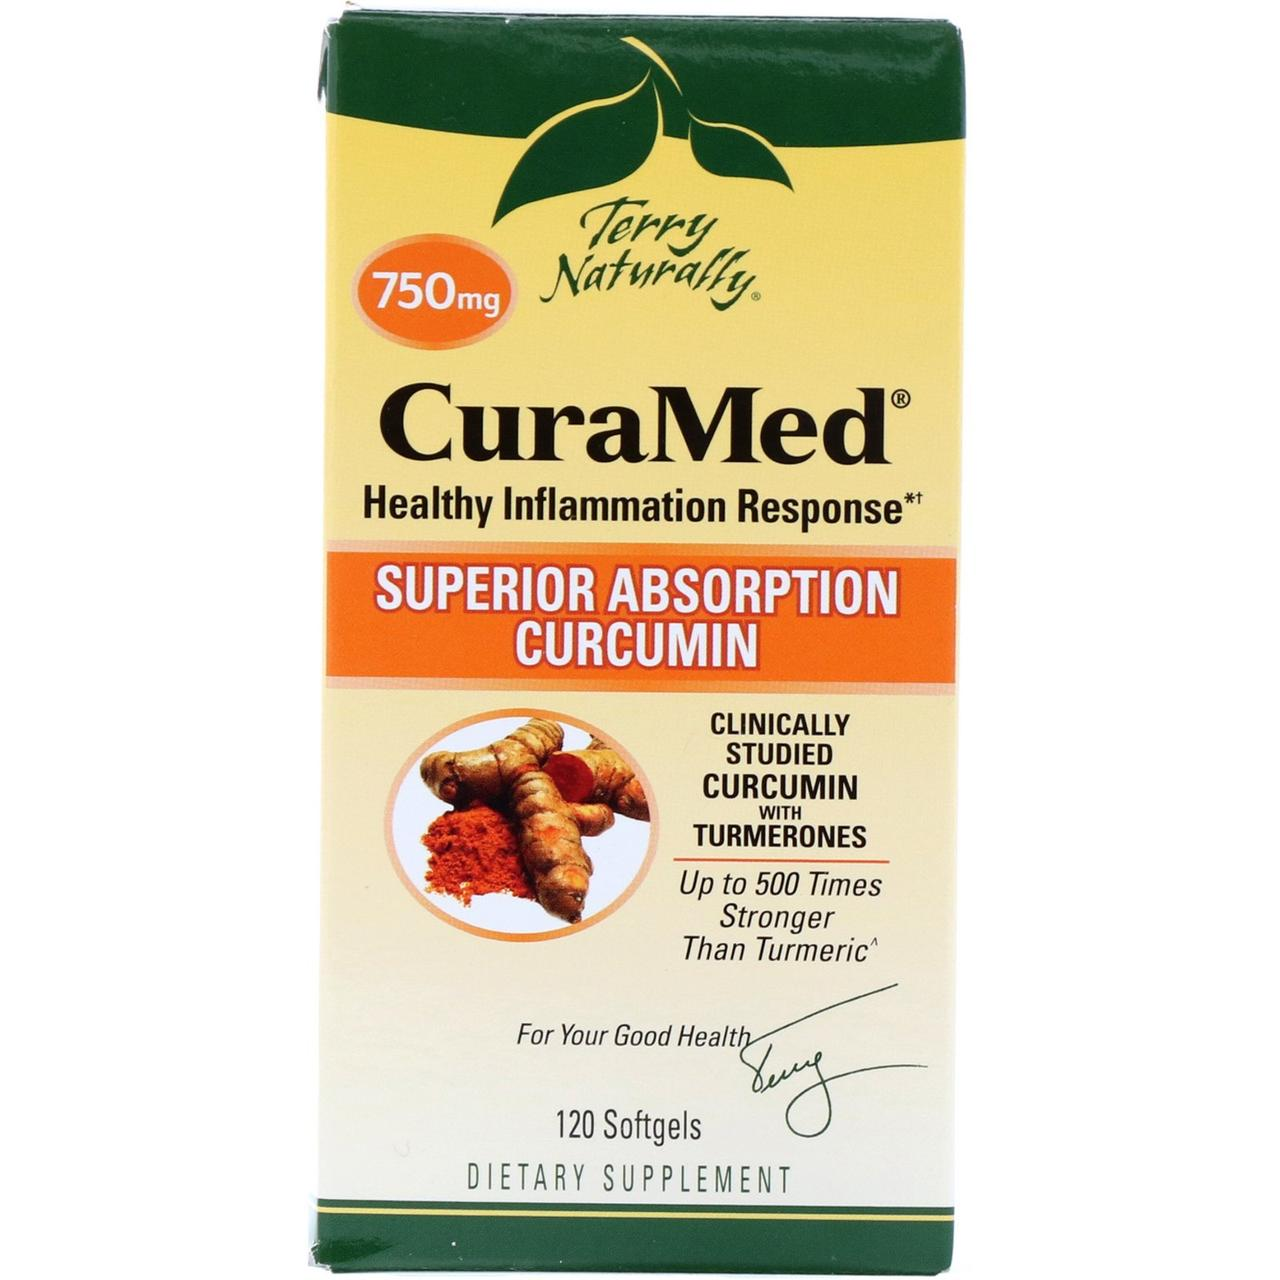 Курамед против воспаления CuraMed, 750 мг, EuroPharma, 120 капсул